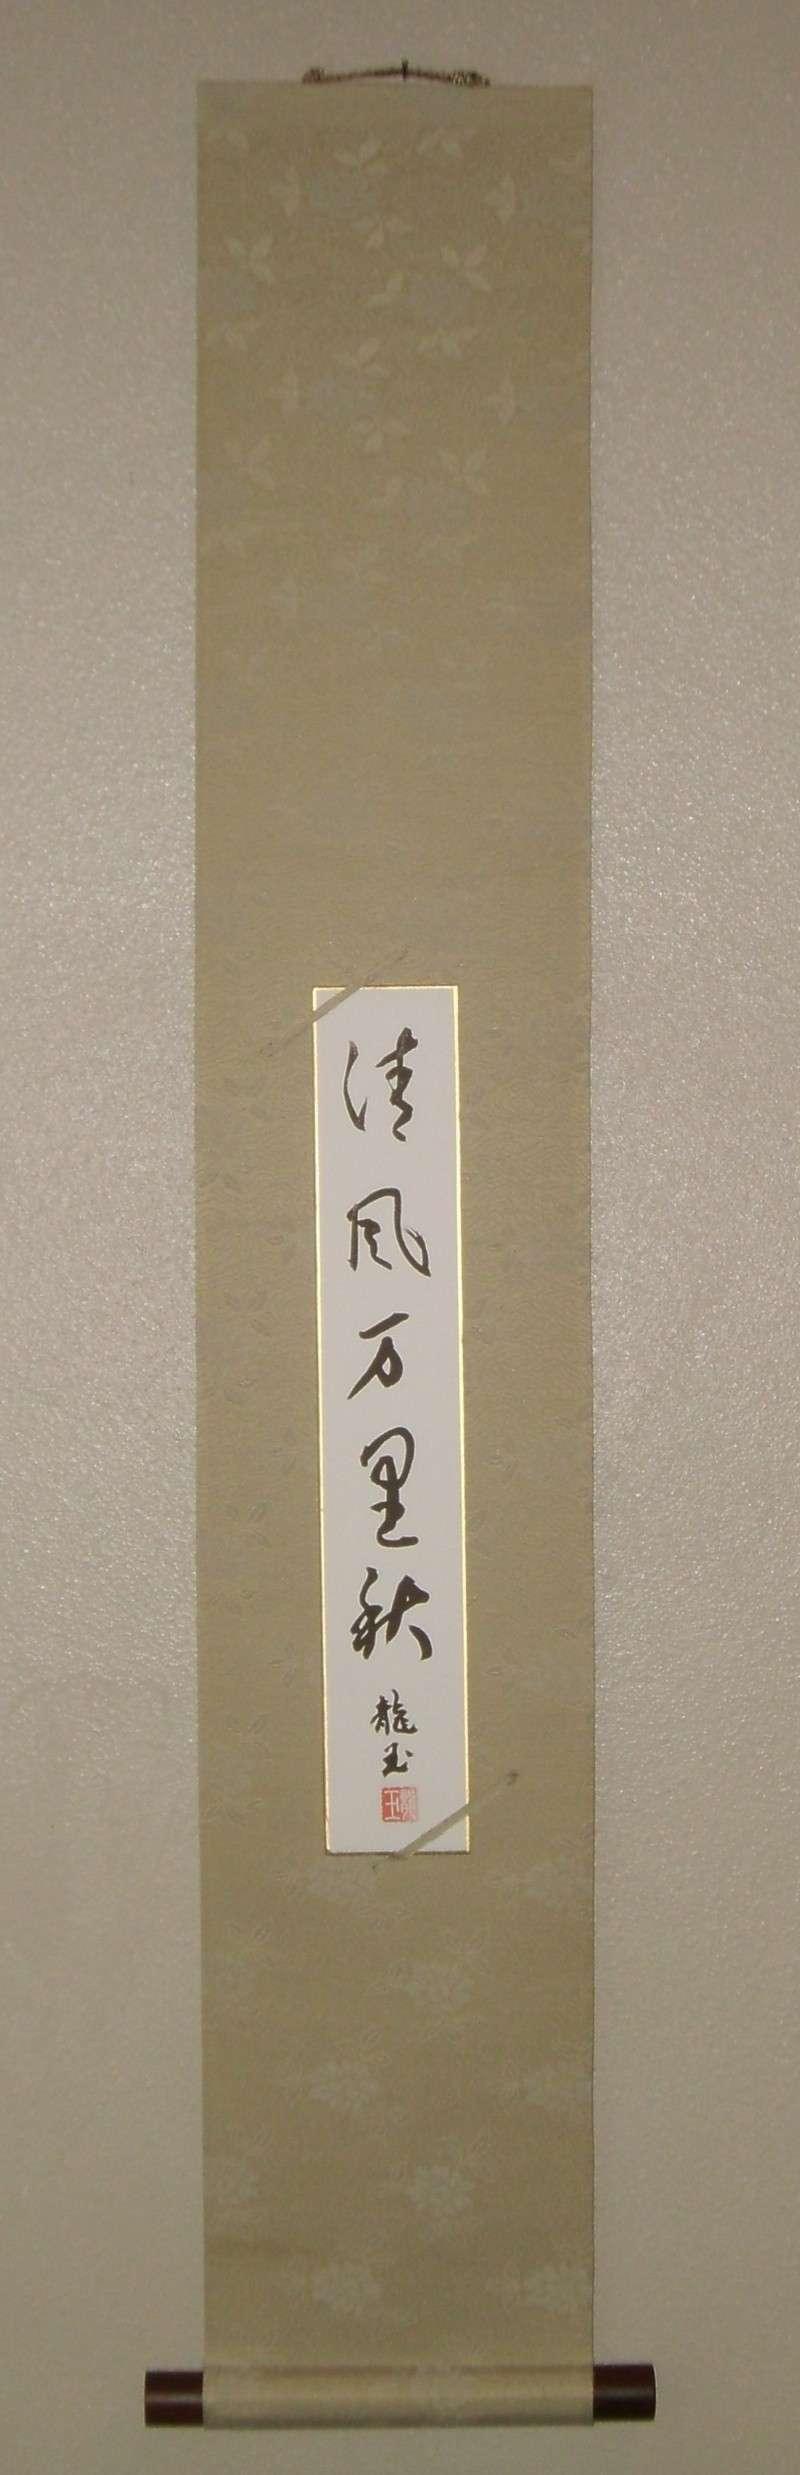 GSBF Convention Tansaku Kake Order Bonsai11